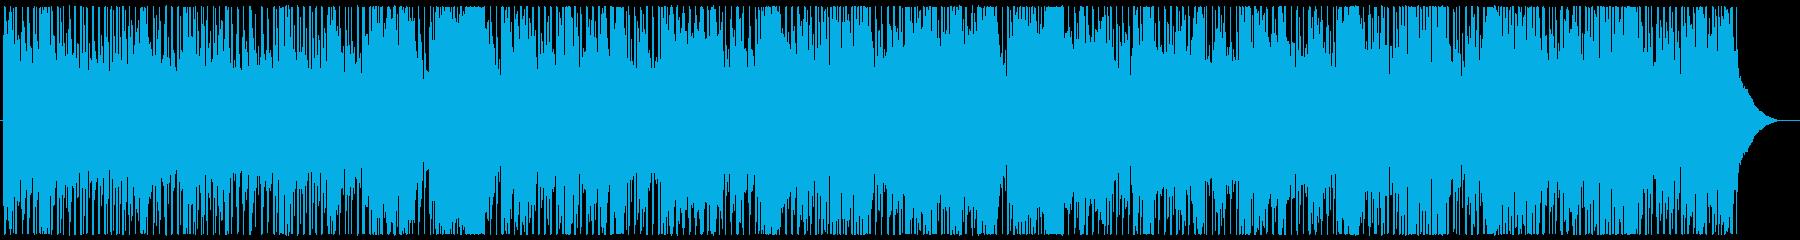 Listerineの再生済みの波形